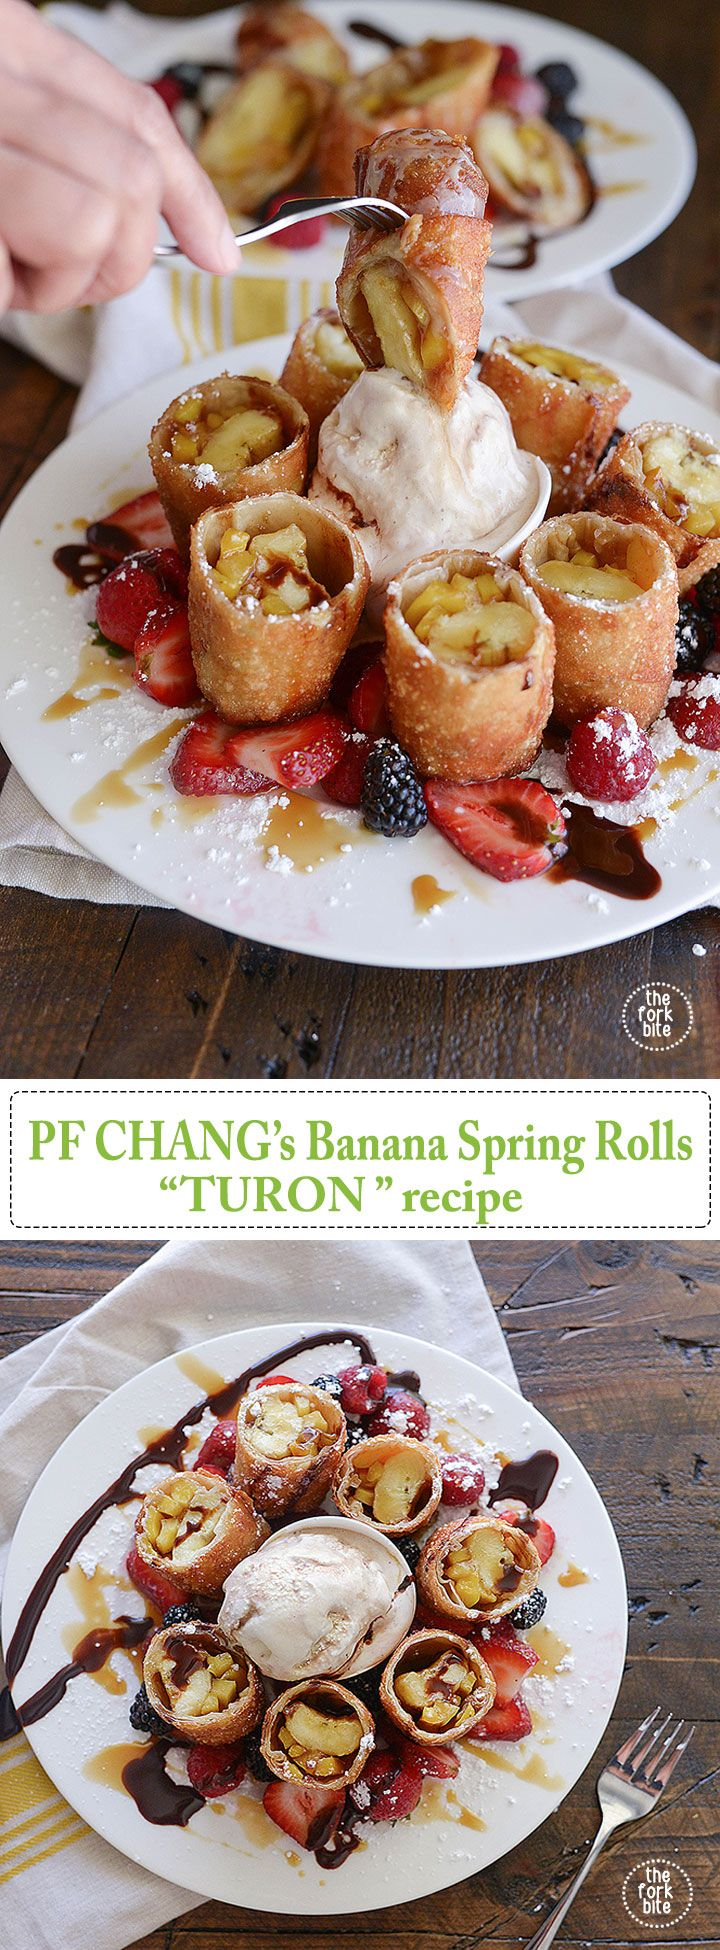 PF Chang banana spring rolls - turon recipe